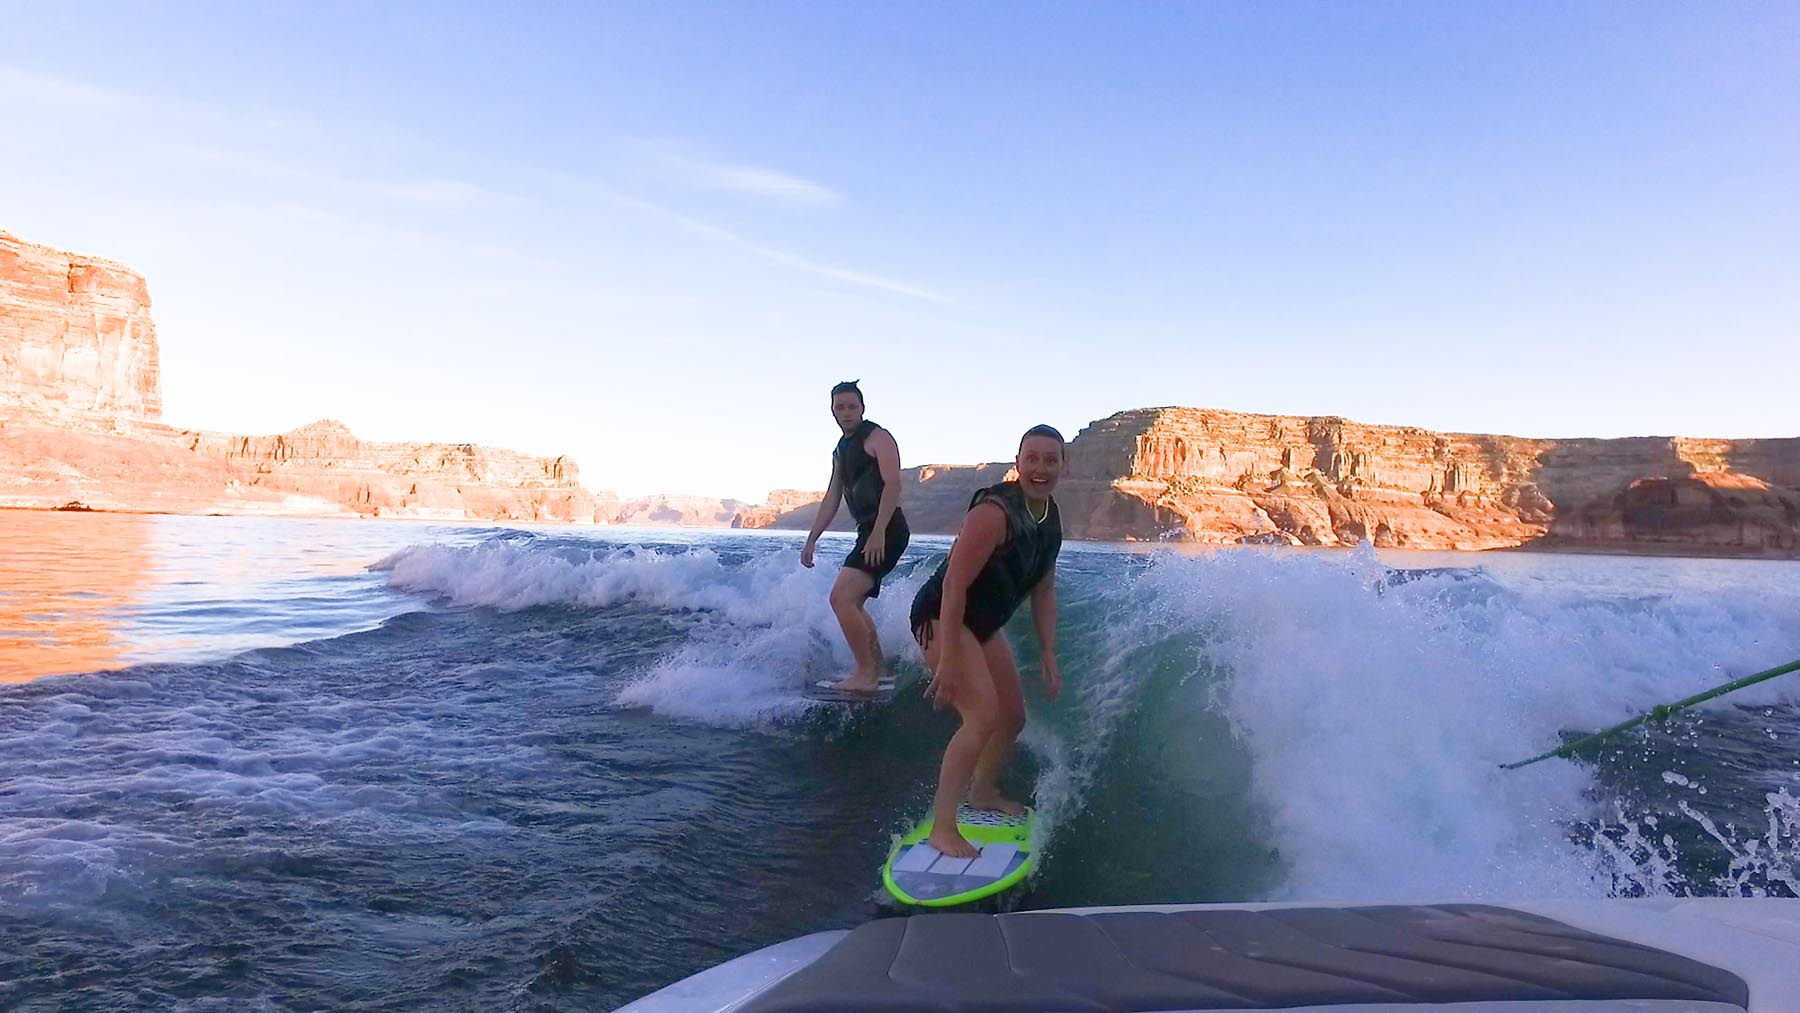 double_surf.jpg